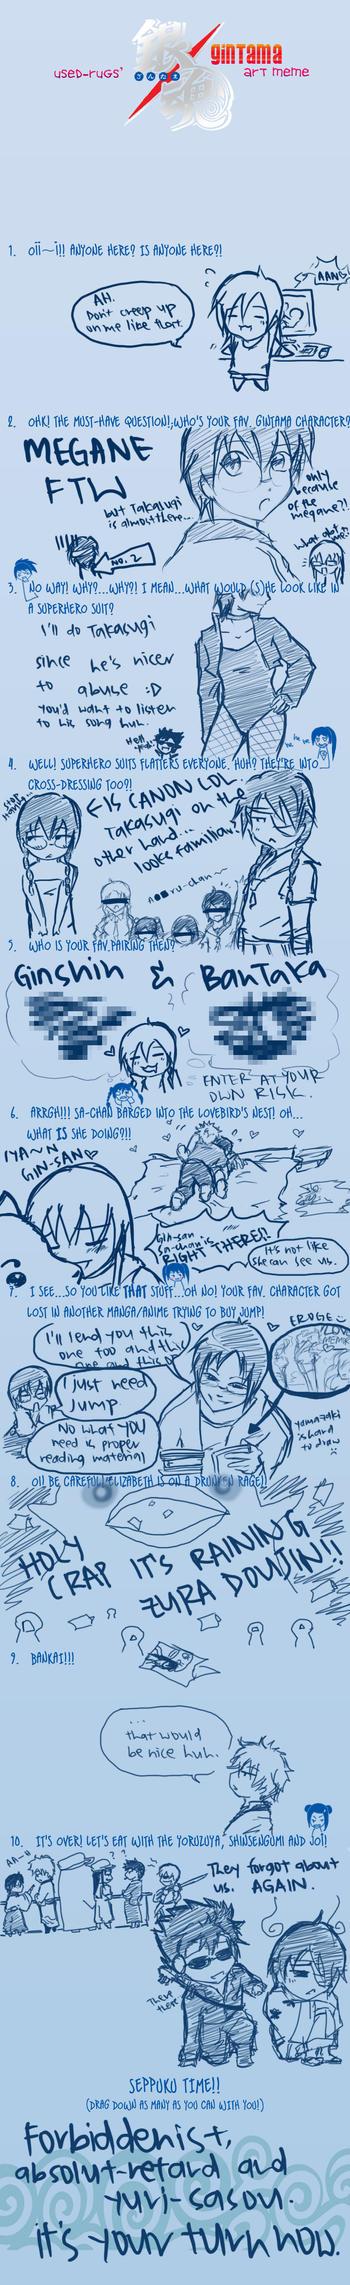 Gintama meme omg by tsukkomimi-mode